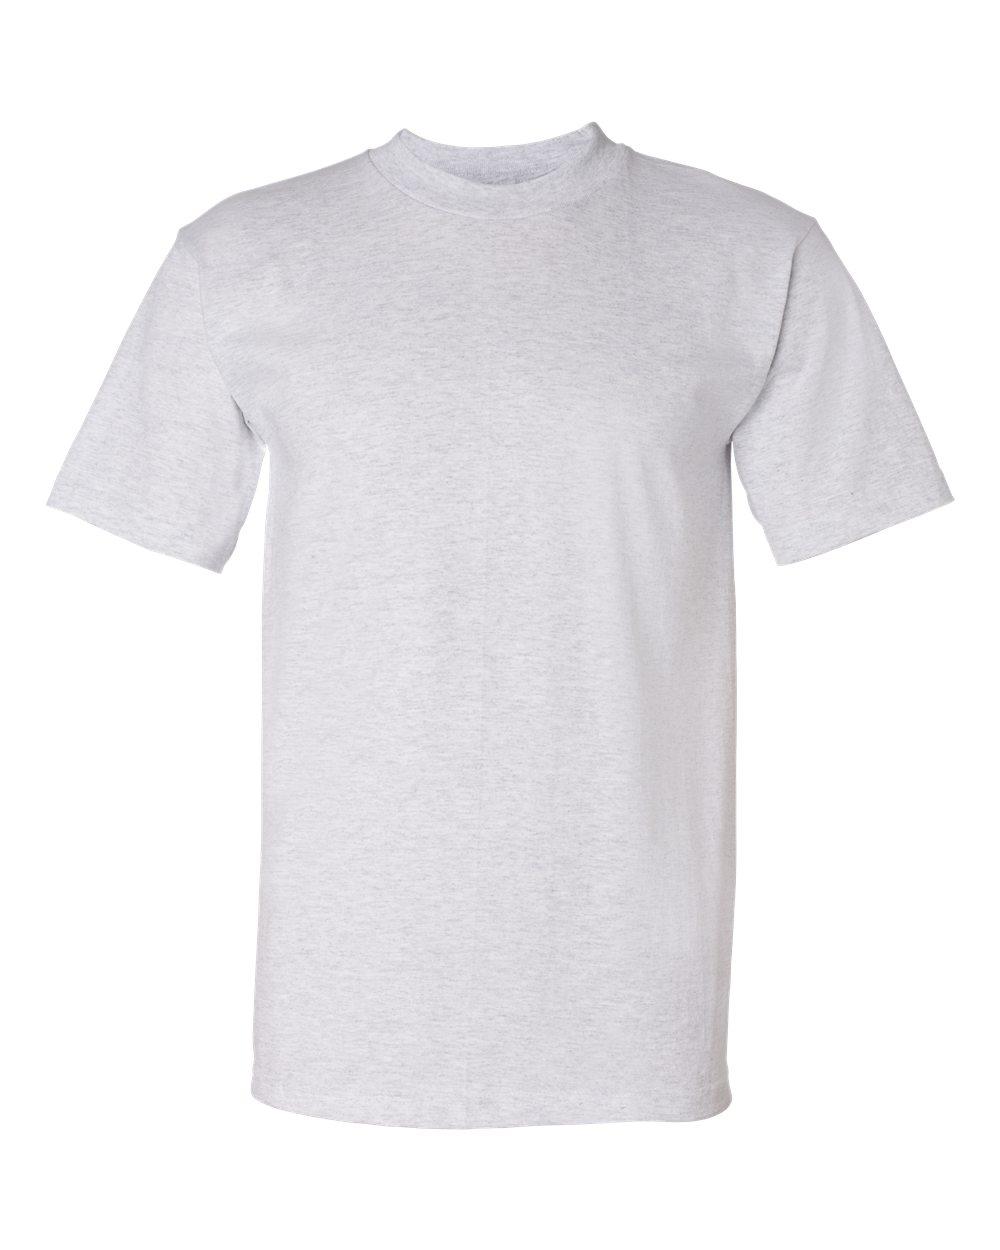 Bayside-Mens-Cotton-Blank-USA-Made-Short-Sleeve-T-Shirt-5100-up-to-5XL thumbnail 6